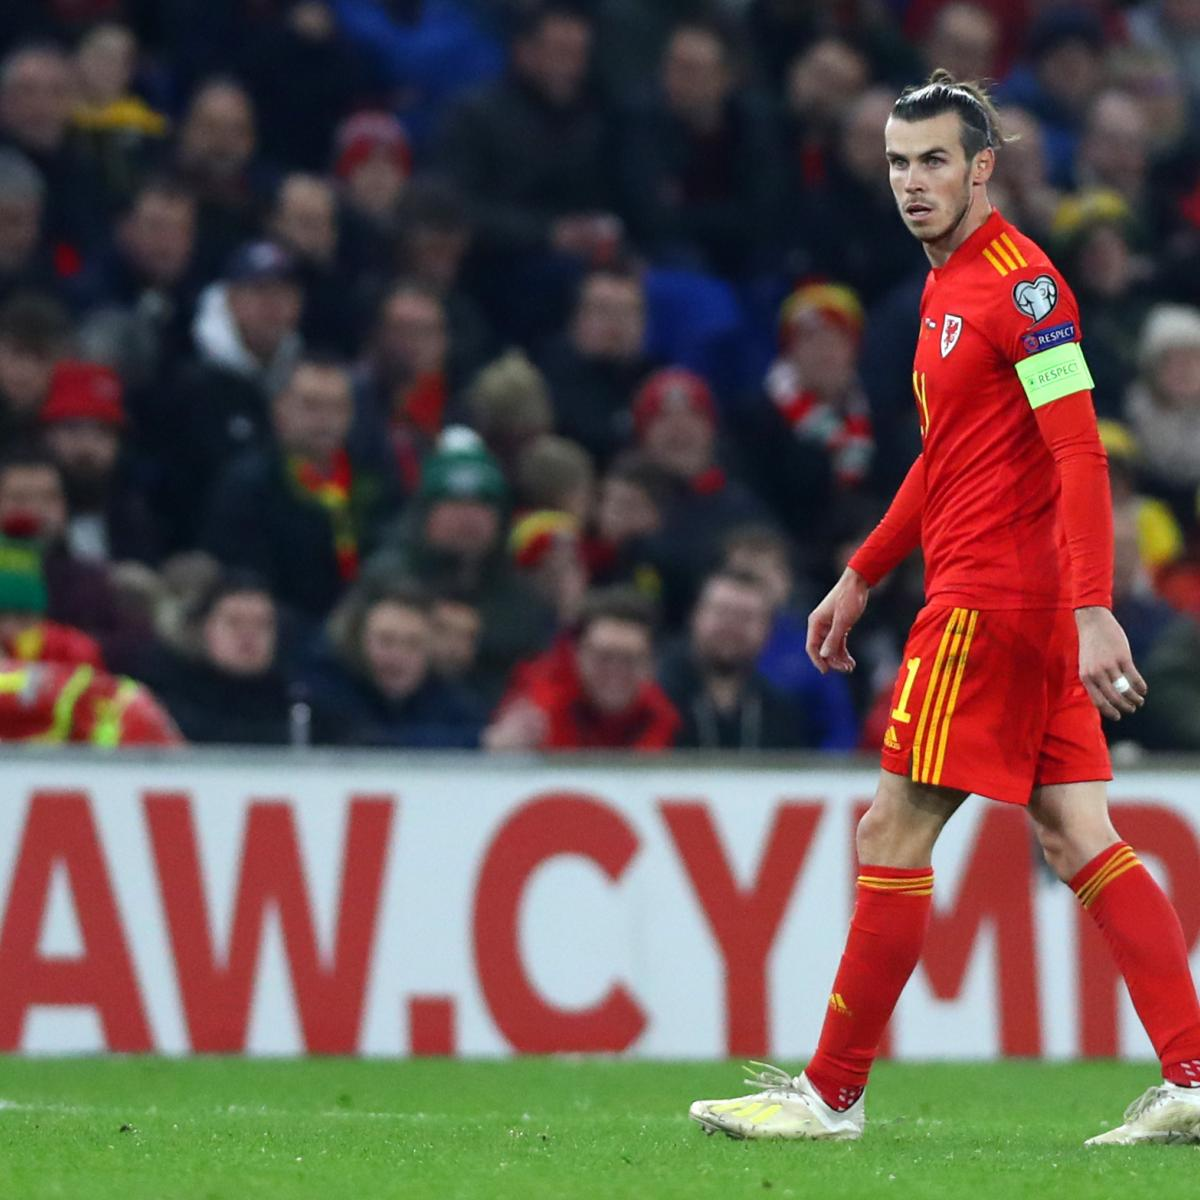 Gareth Bale's Agent Fires Back at Spanish Press over Golf Flag Criticism